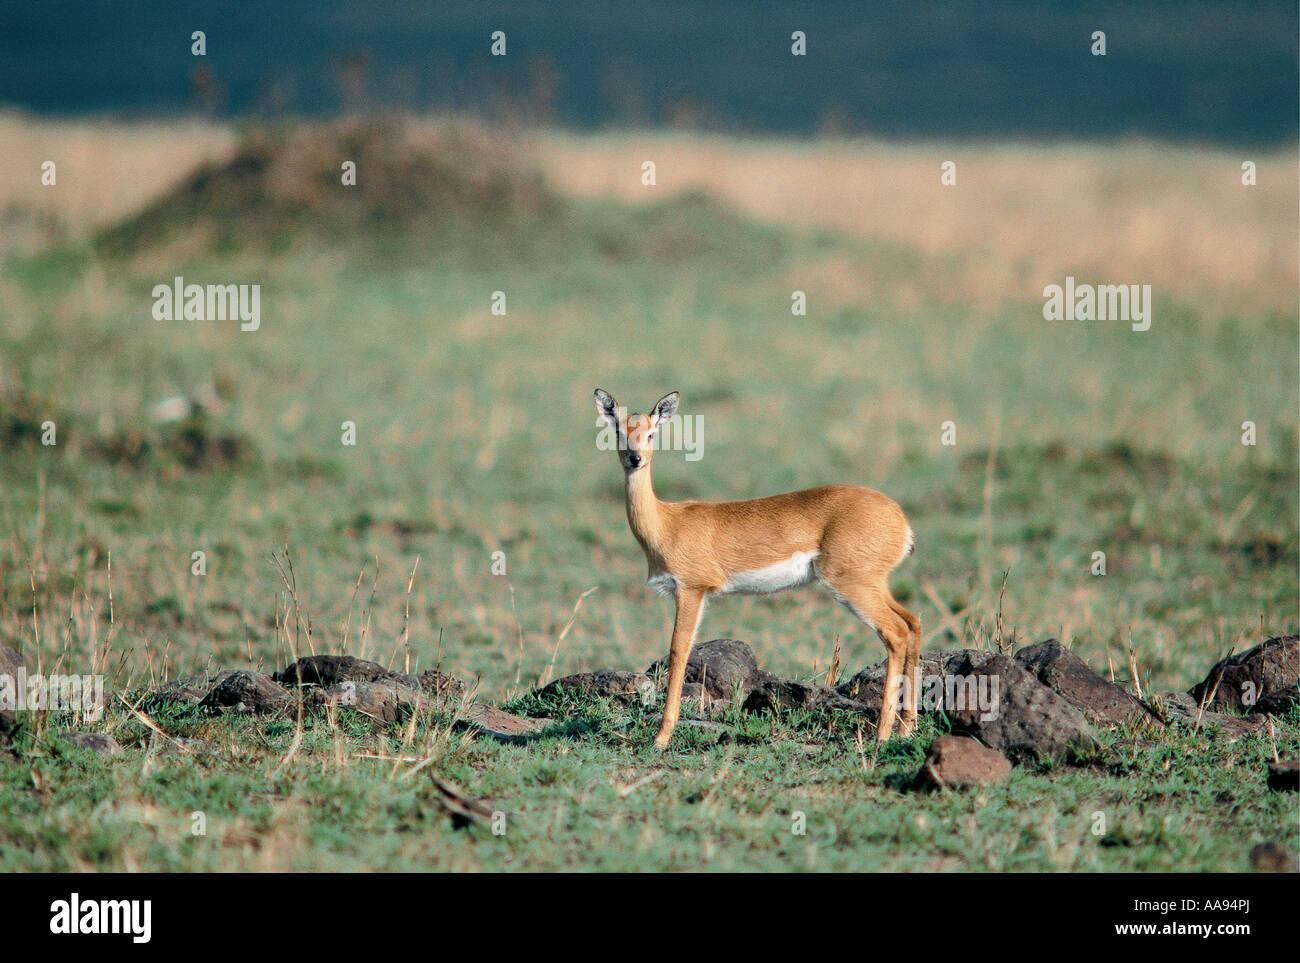 Female Steinbok or Steenbok a small reddish antelope Masai Mara National Reserve Kenya - Stock Image